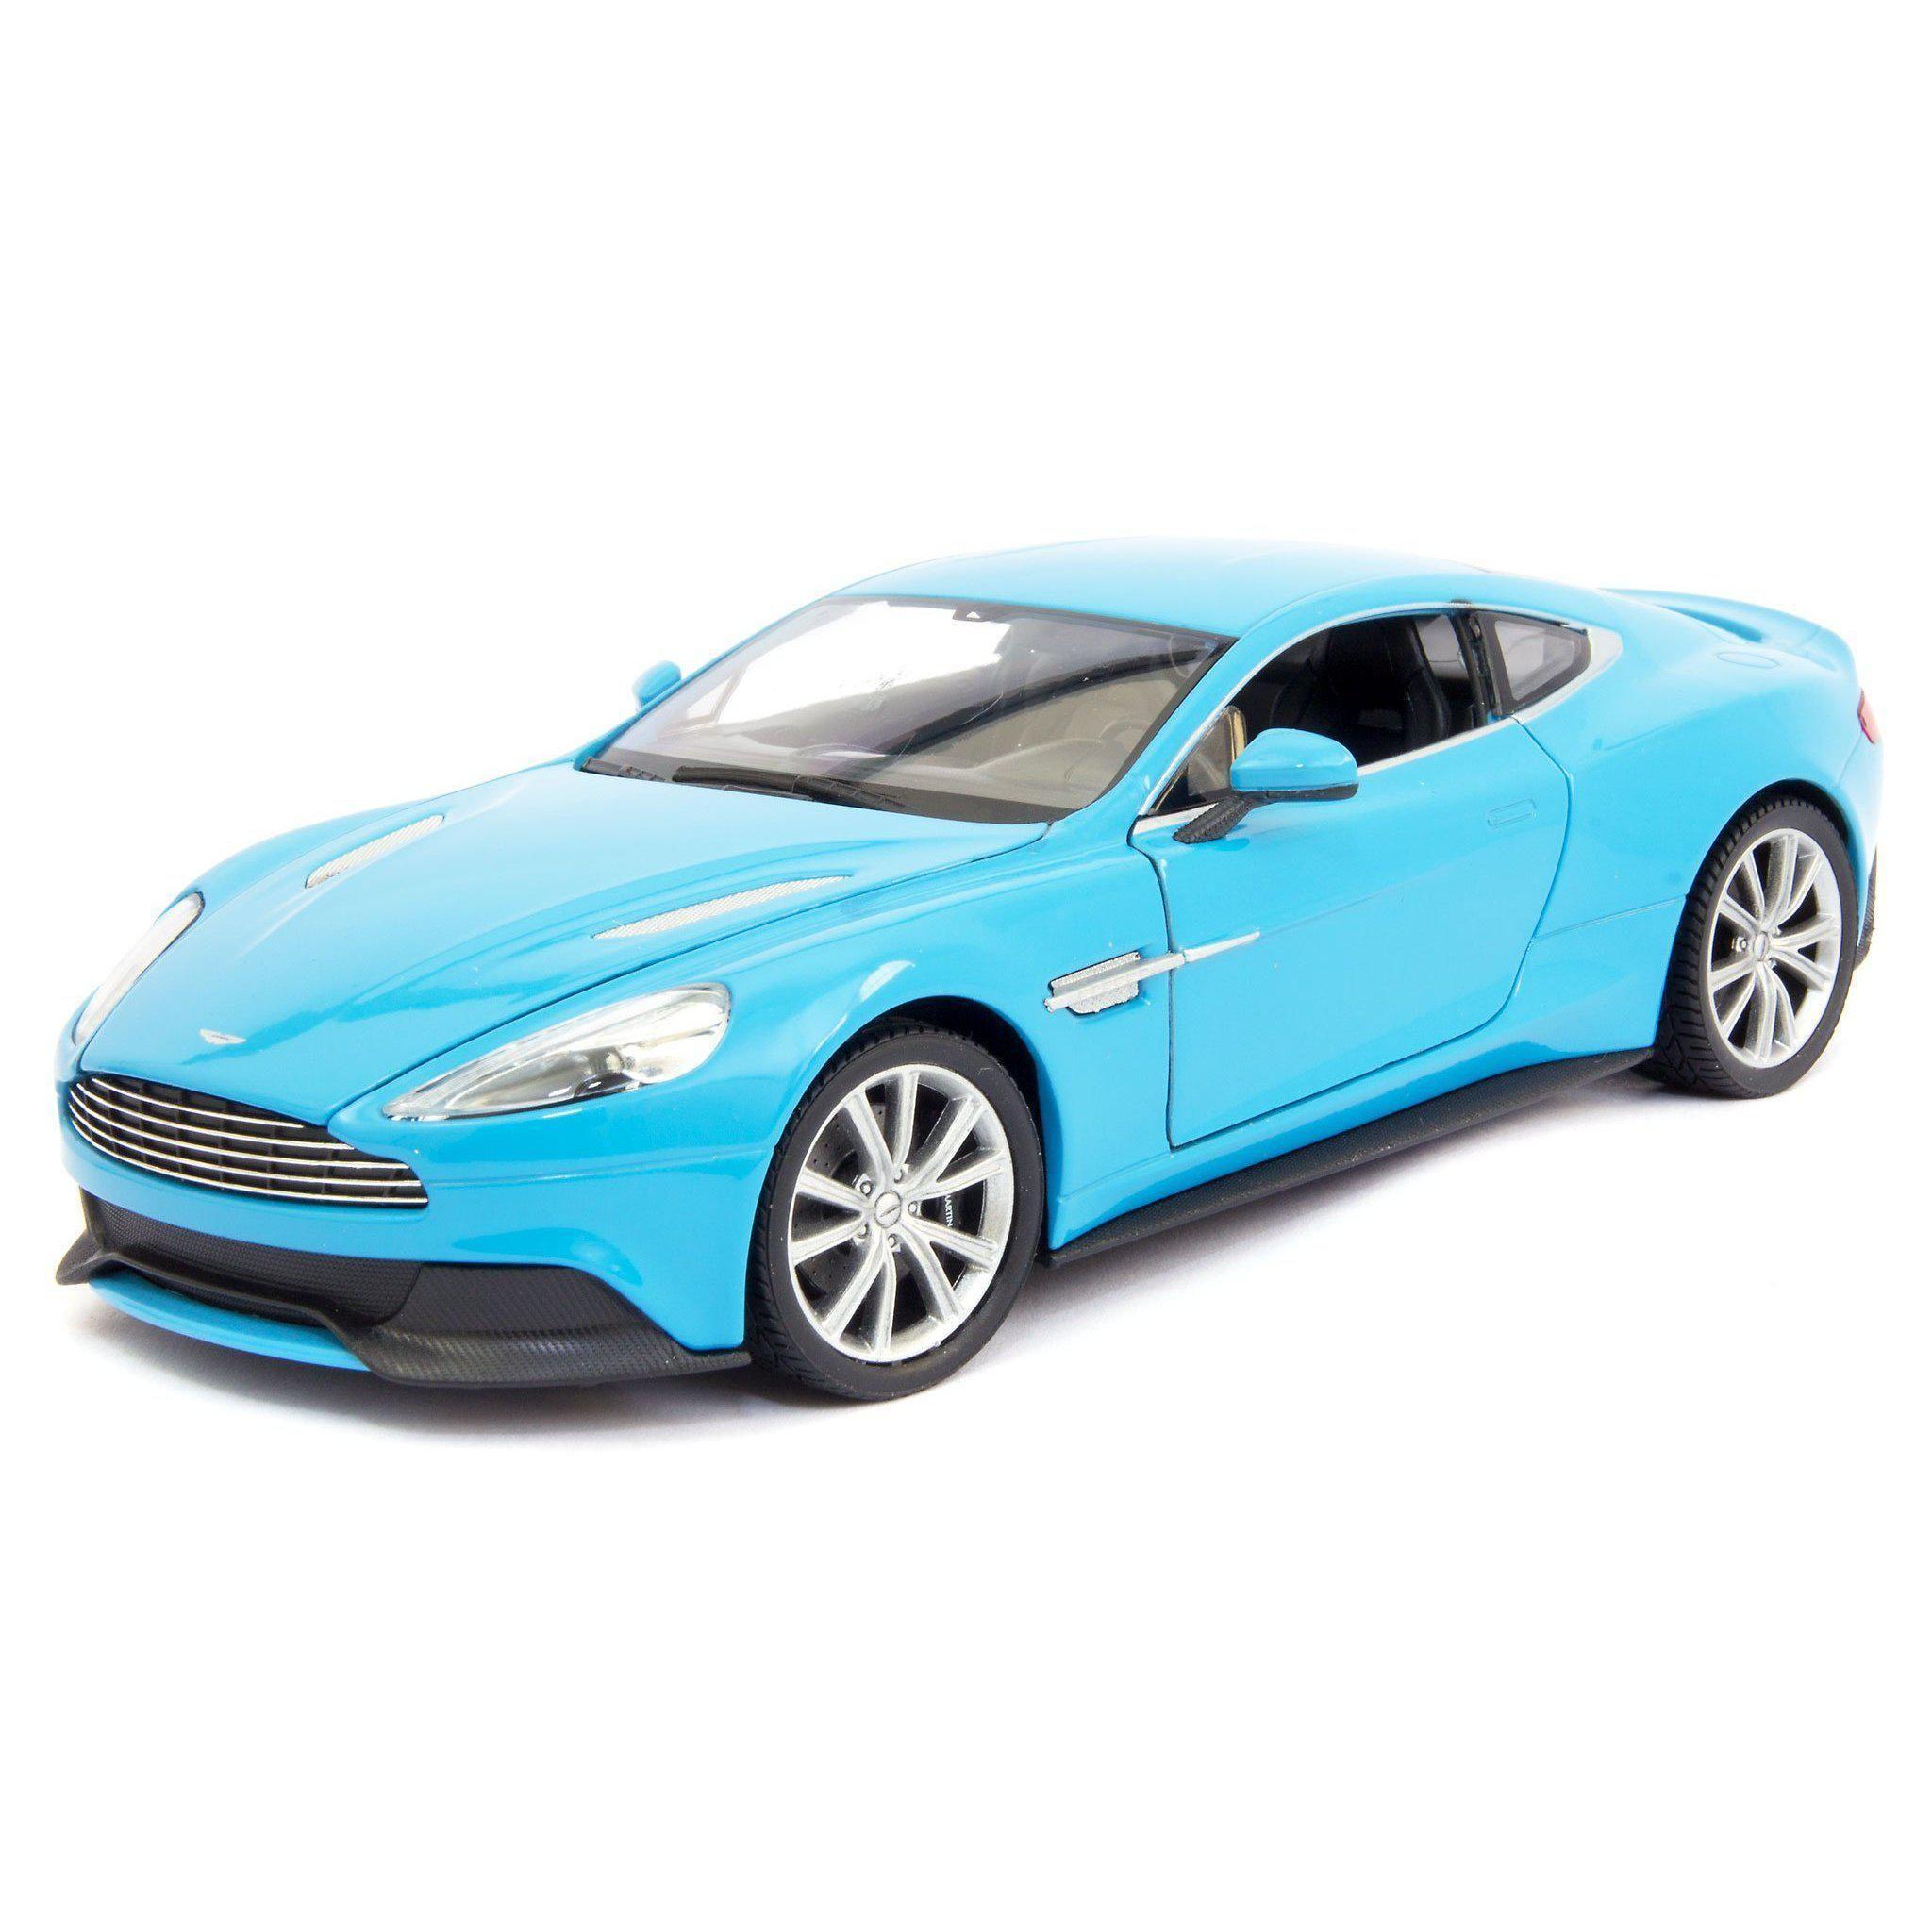 Aston Martin Vanquish Diecast Model Car 124 Scale